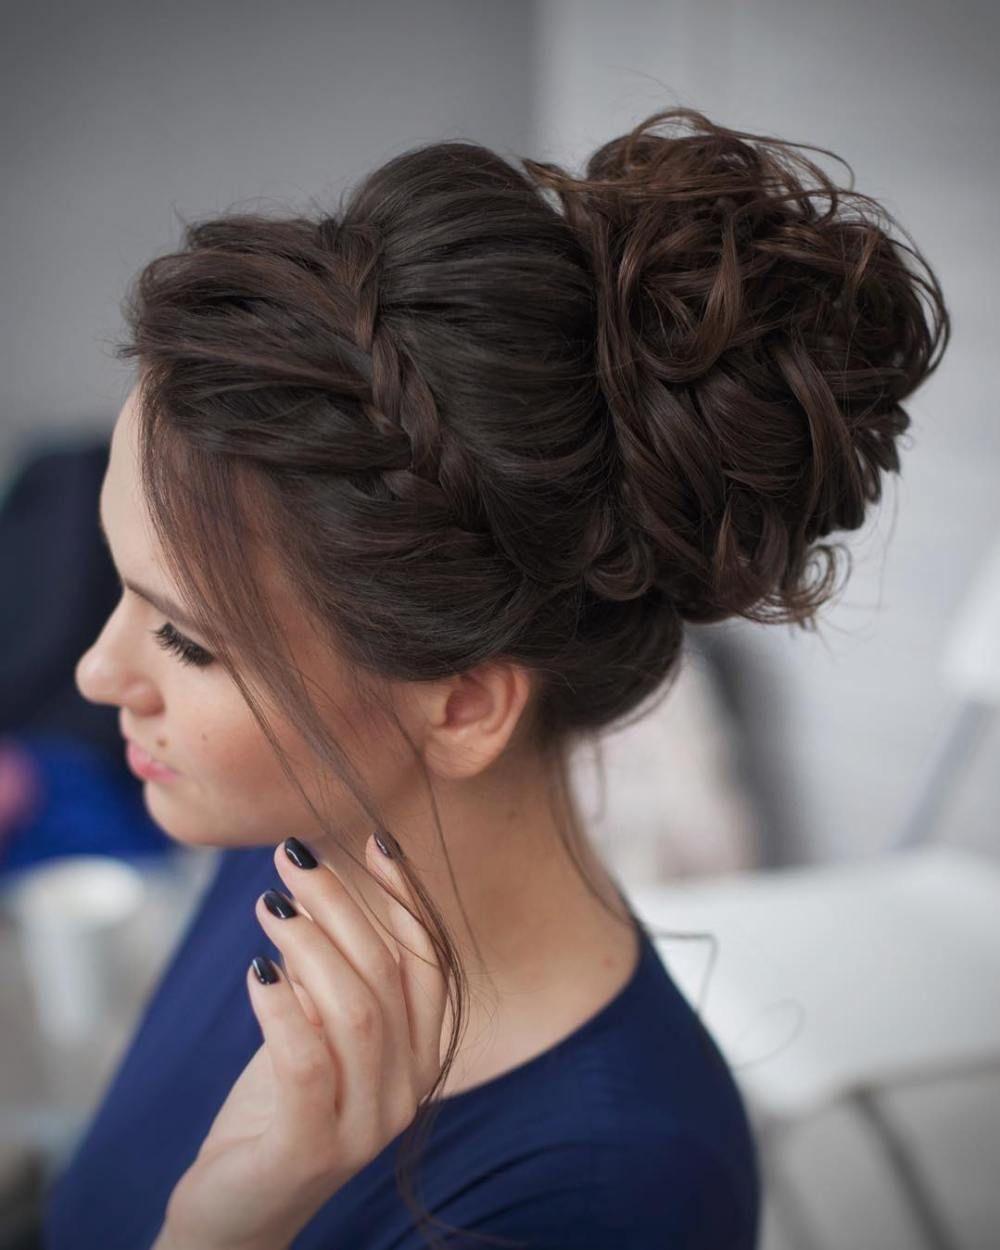 Chignon Mariage Invitee I 63 Idees Coiffures Invitee Parfaites Pour Marriage Coiffure Cheveux Mi Long Mariage Chignon Mariage Invitee Mariage Cheveux Boucles